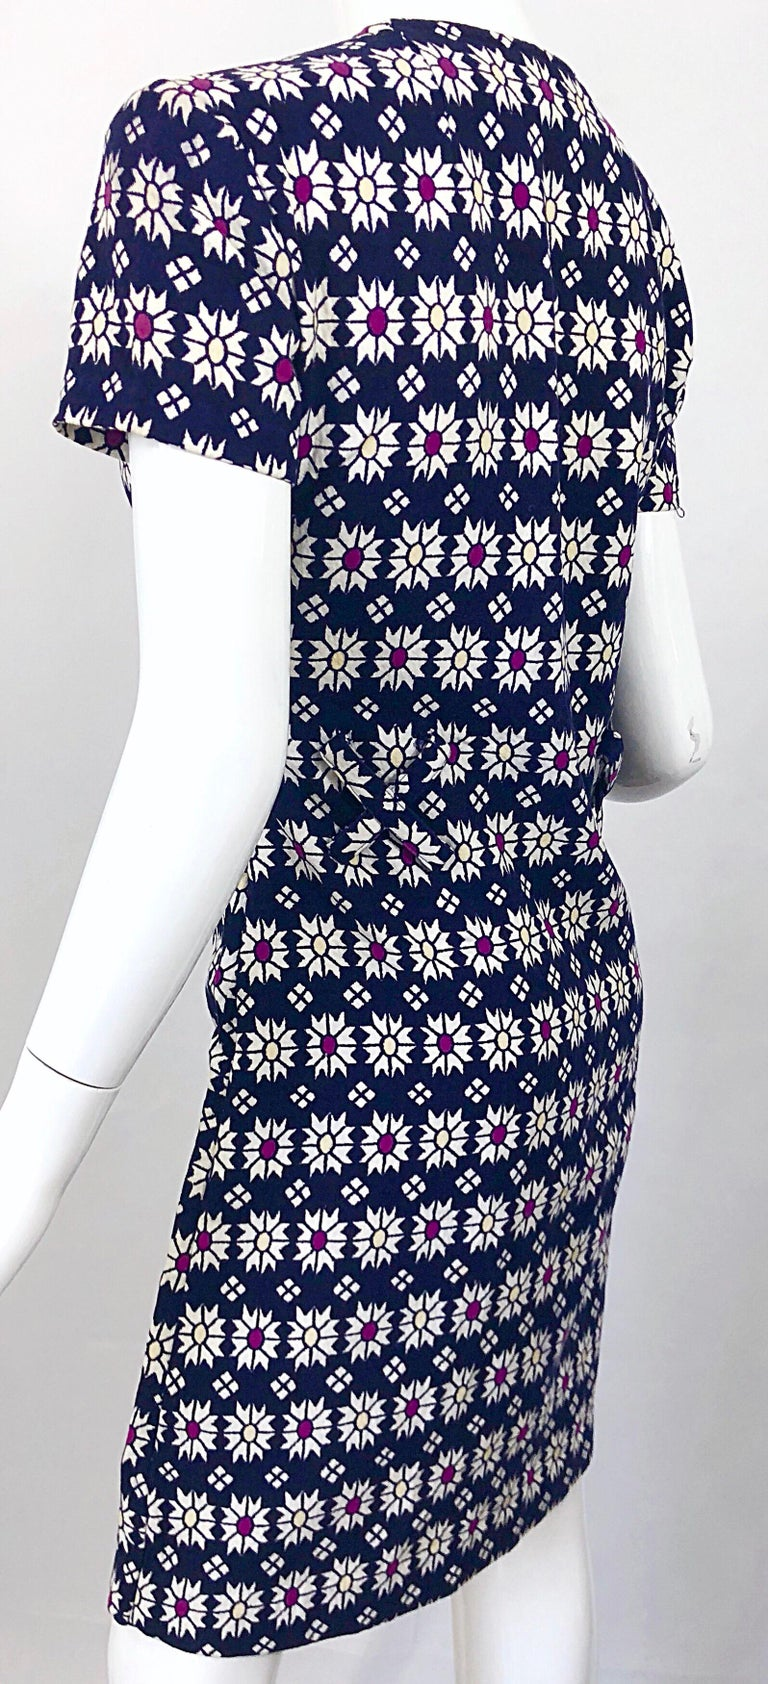 Chic 1960s Navy Blue + Fuchsia + Yellow Geometric Daisy Print 60s A Line Dress For Sale 3